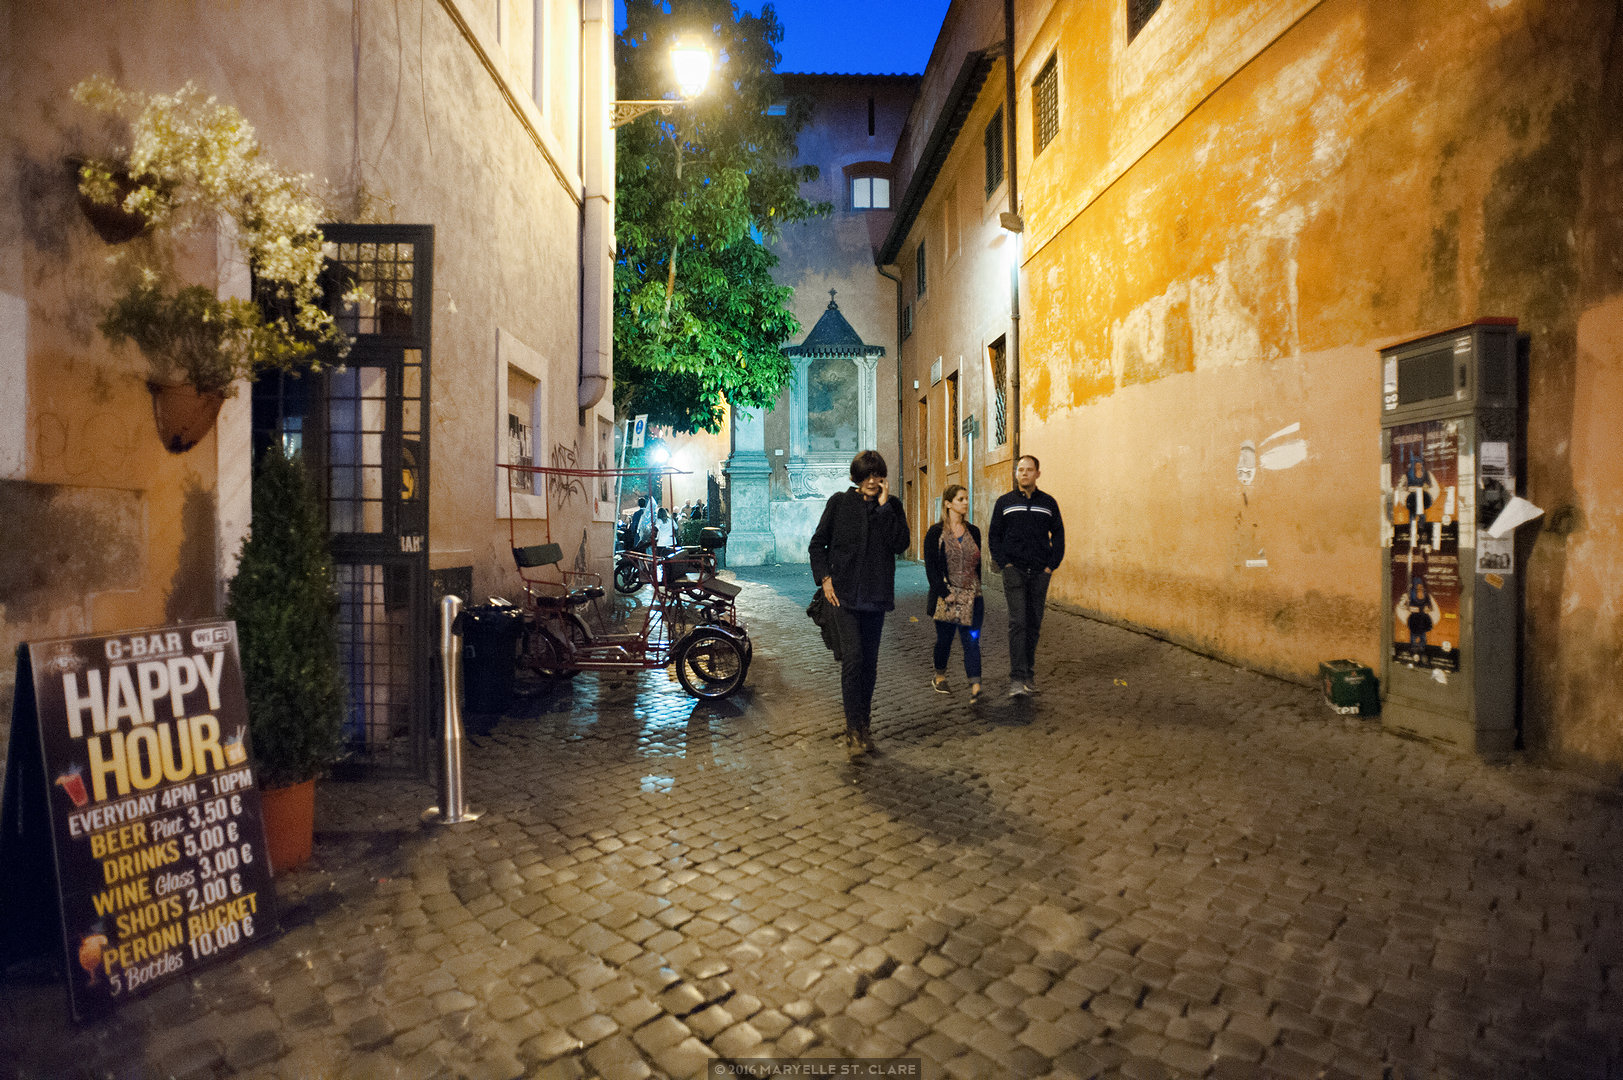 Trastevere neighborhood. Rome, Italy. 2016.